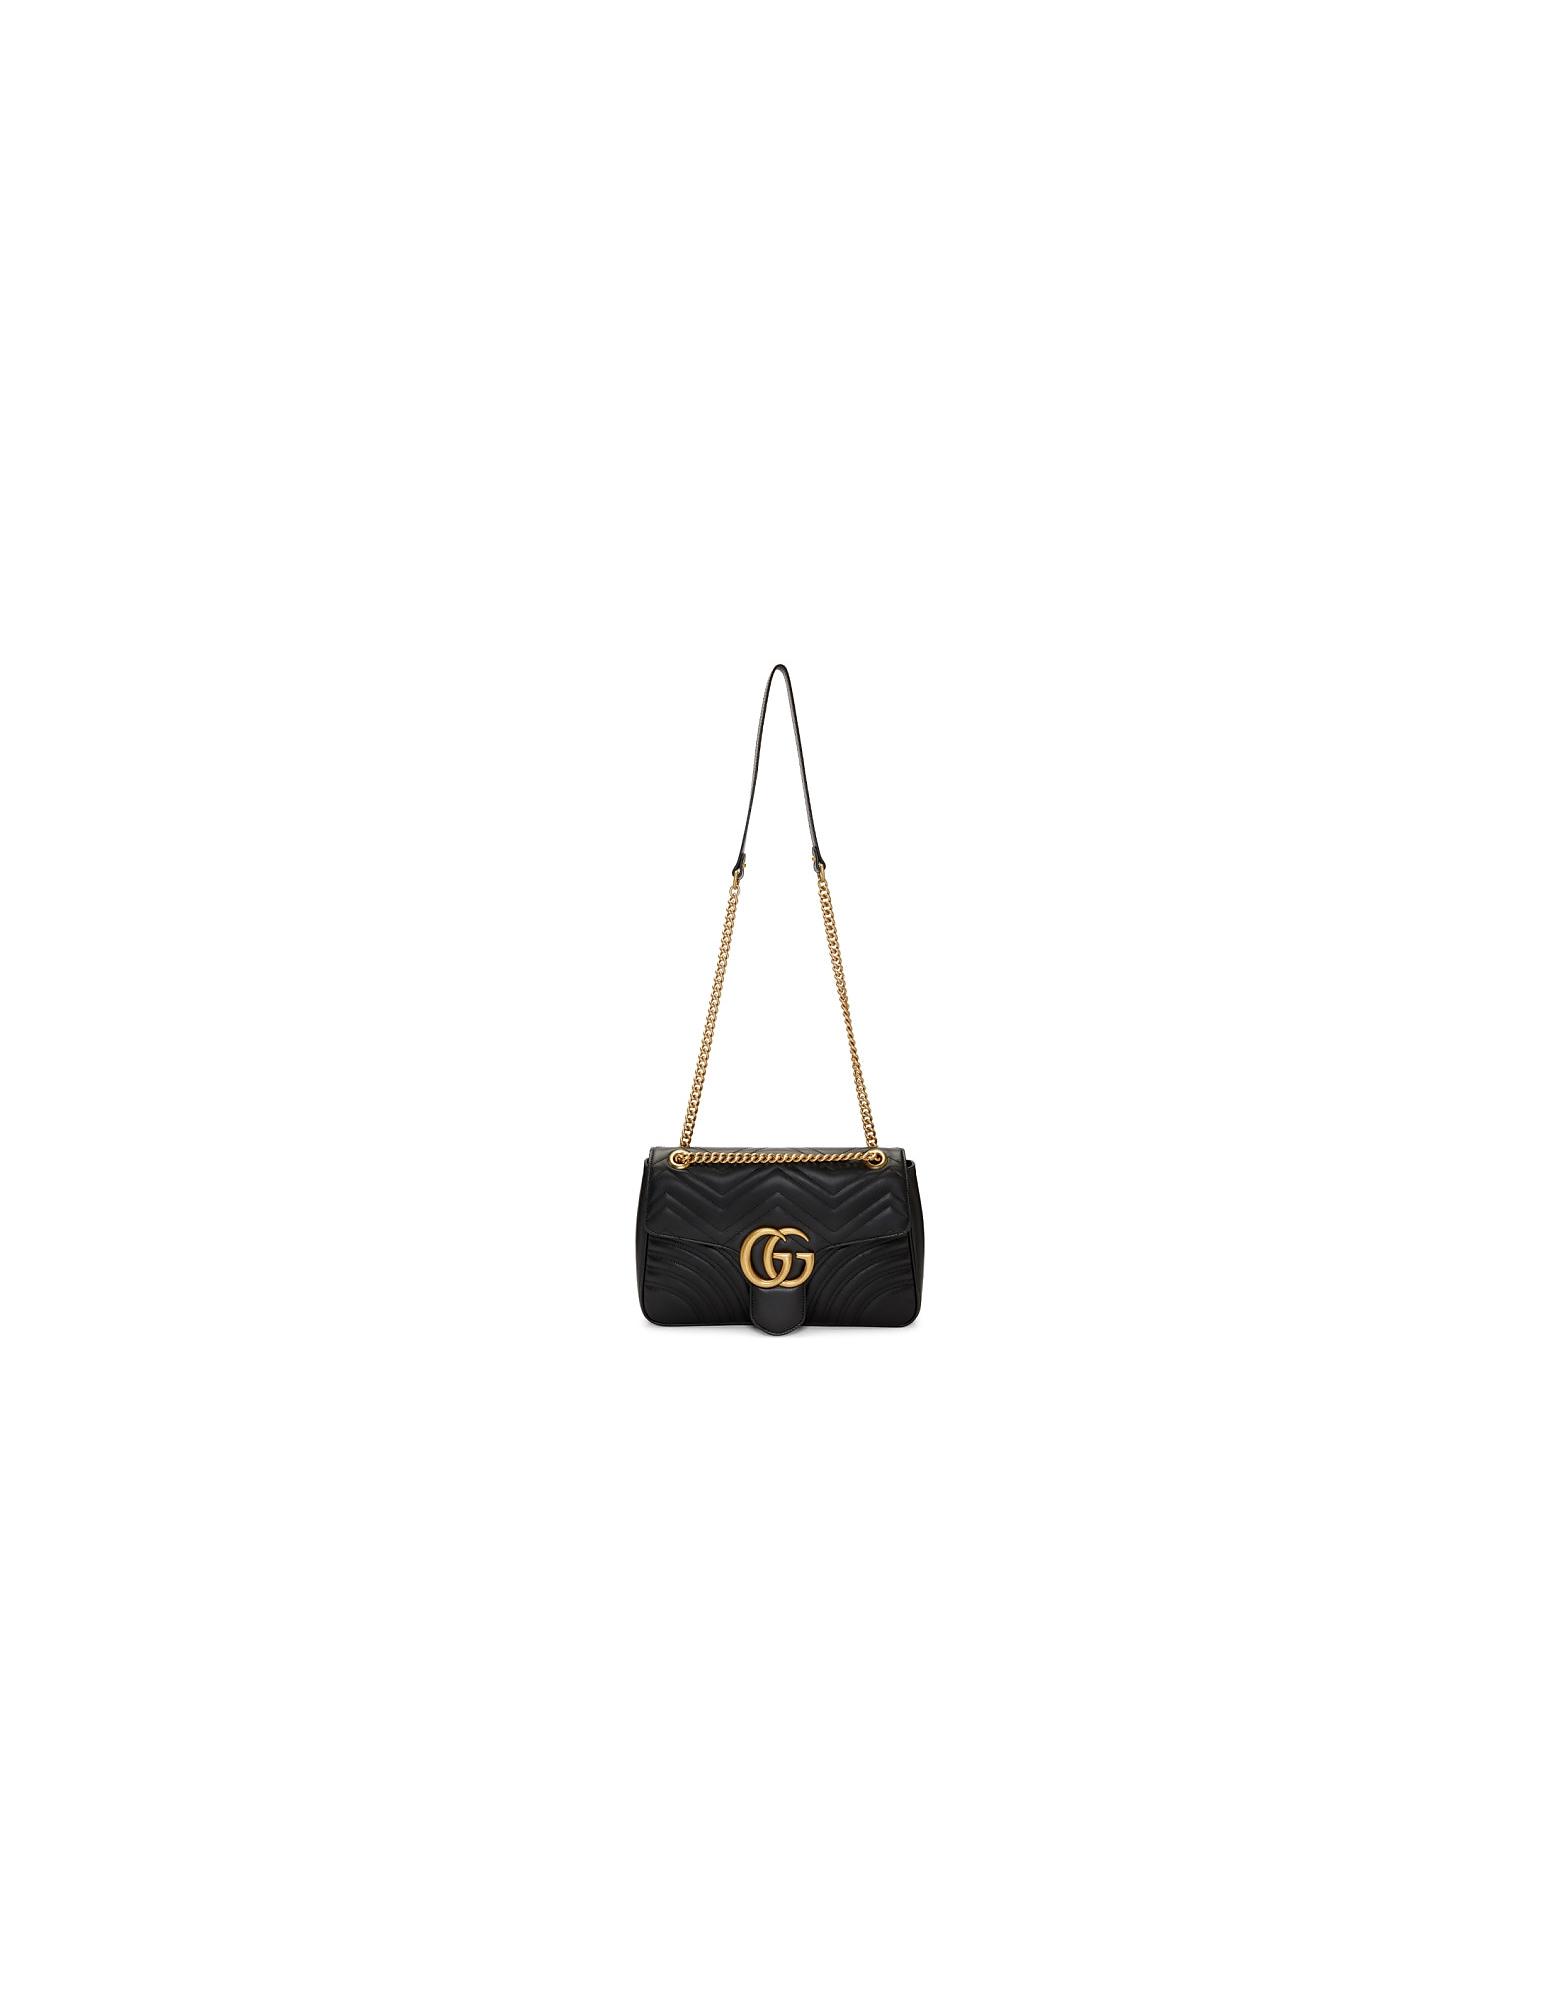 Gucci Designer Handbags, Black Medium GG Marmont 2.0 Shoulder Bag